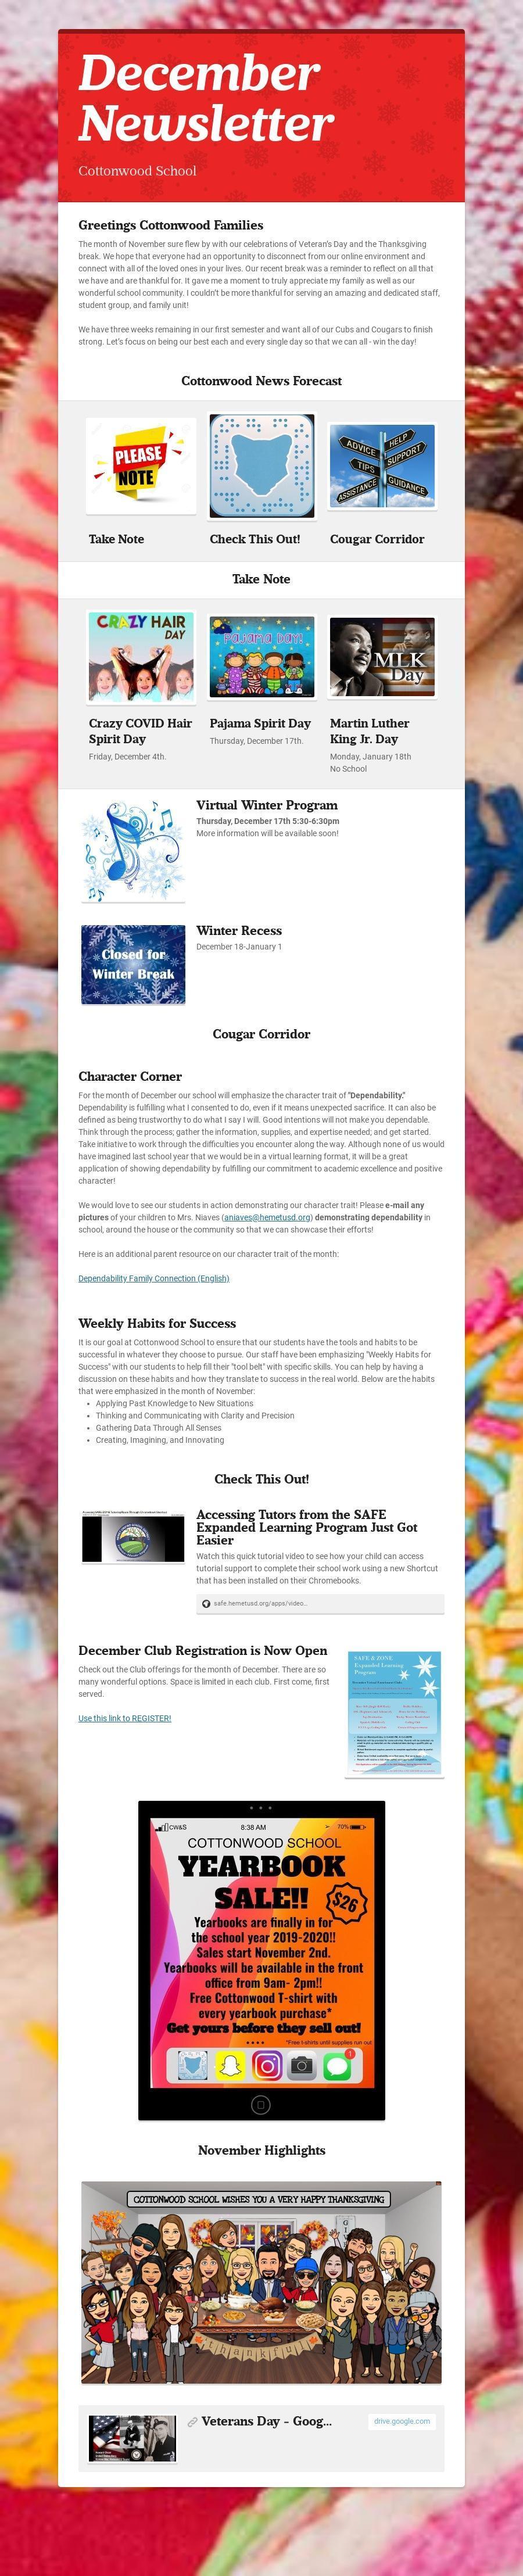 Newsletter December Image